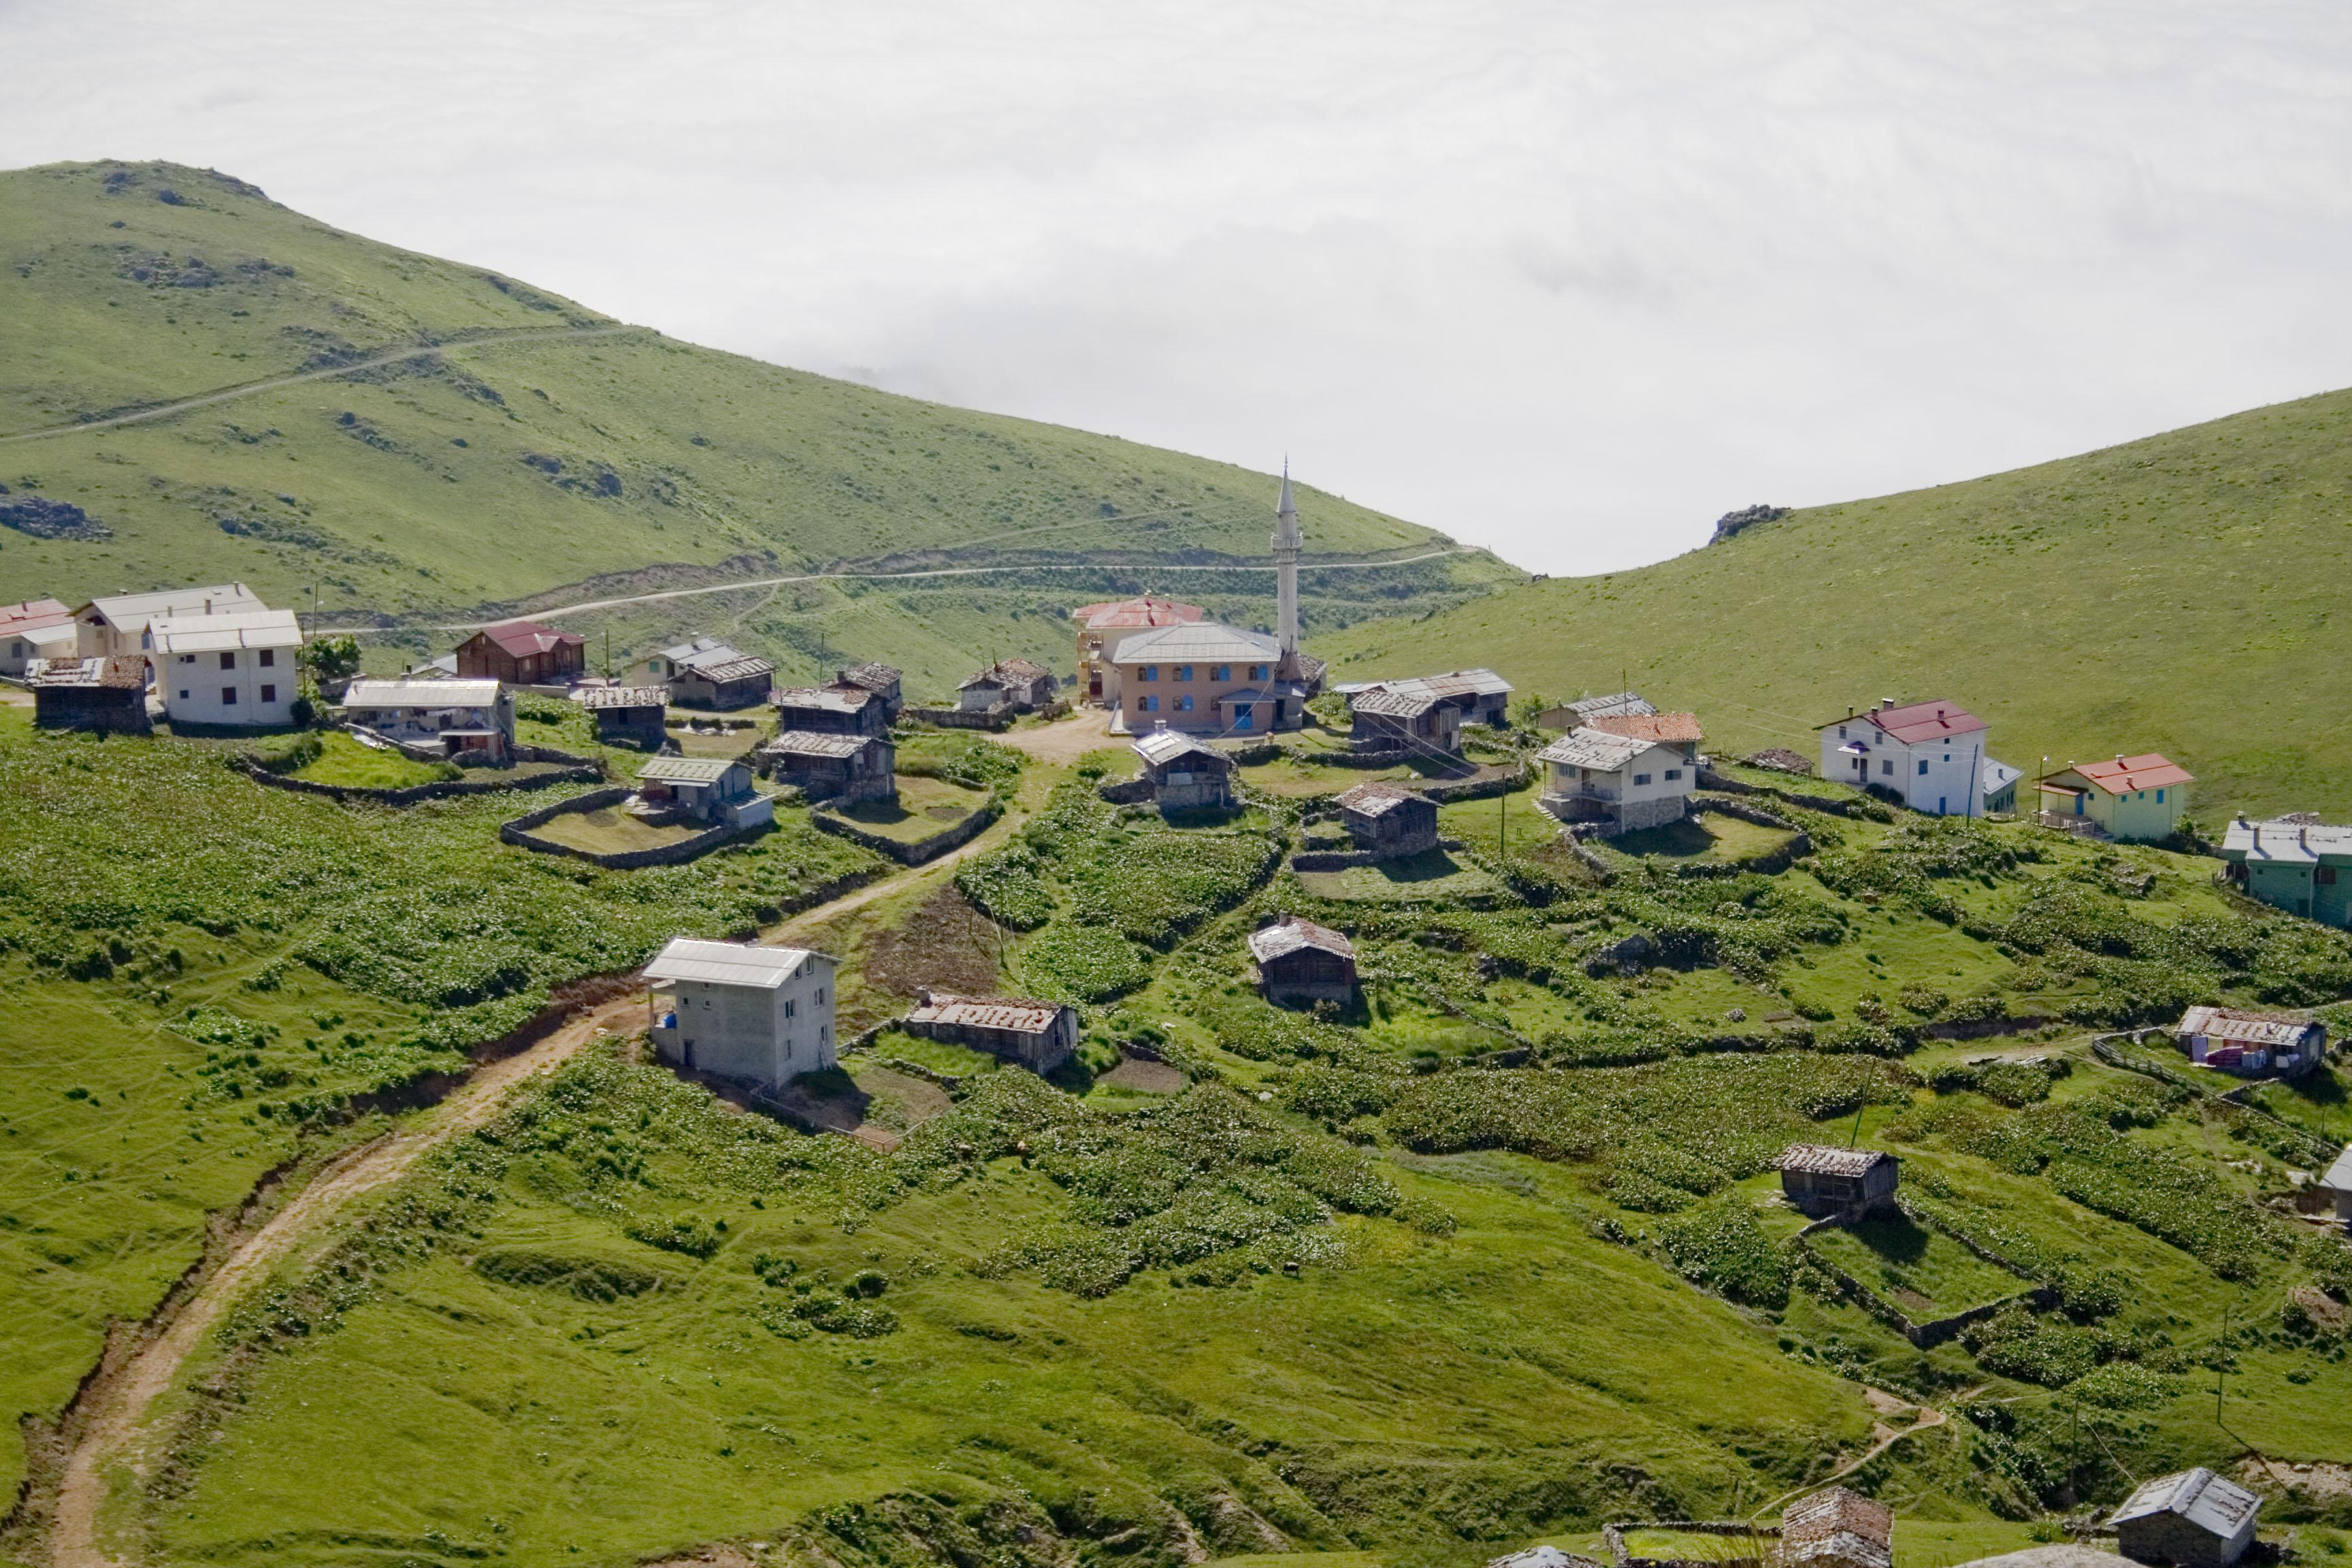 Vilage_near_Çaykara,_Trabzon